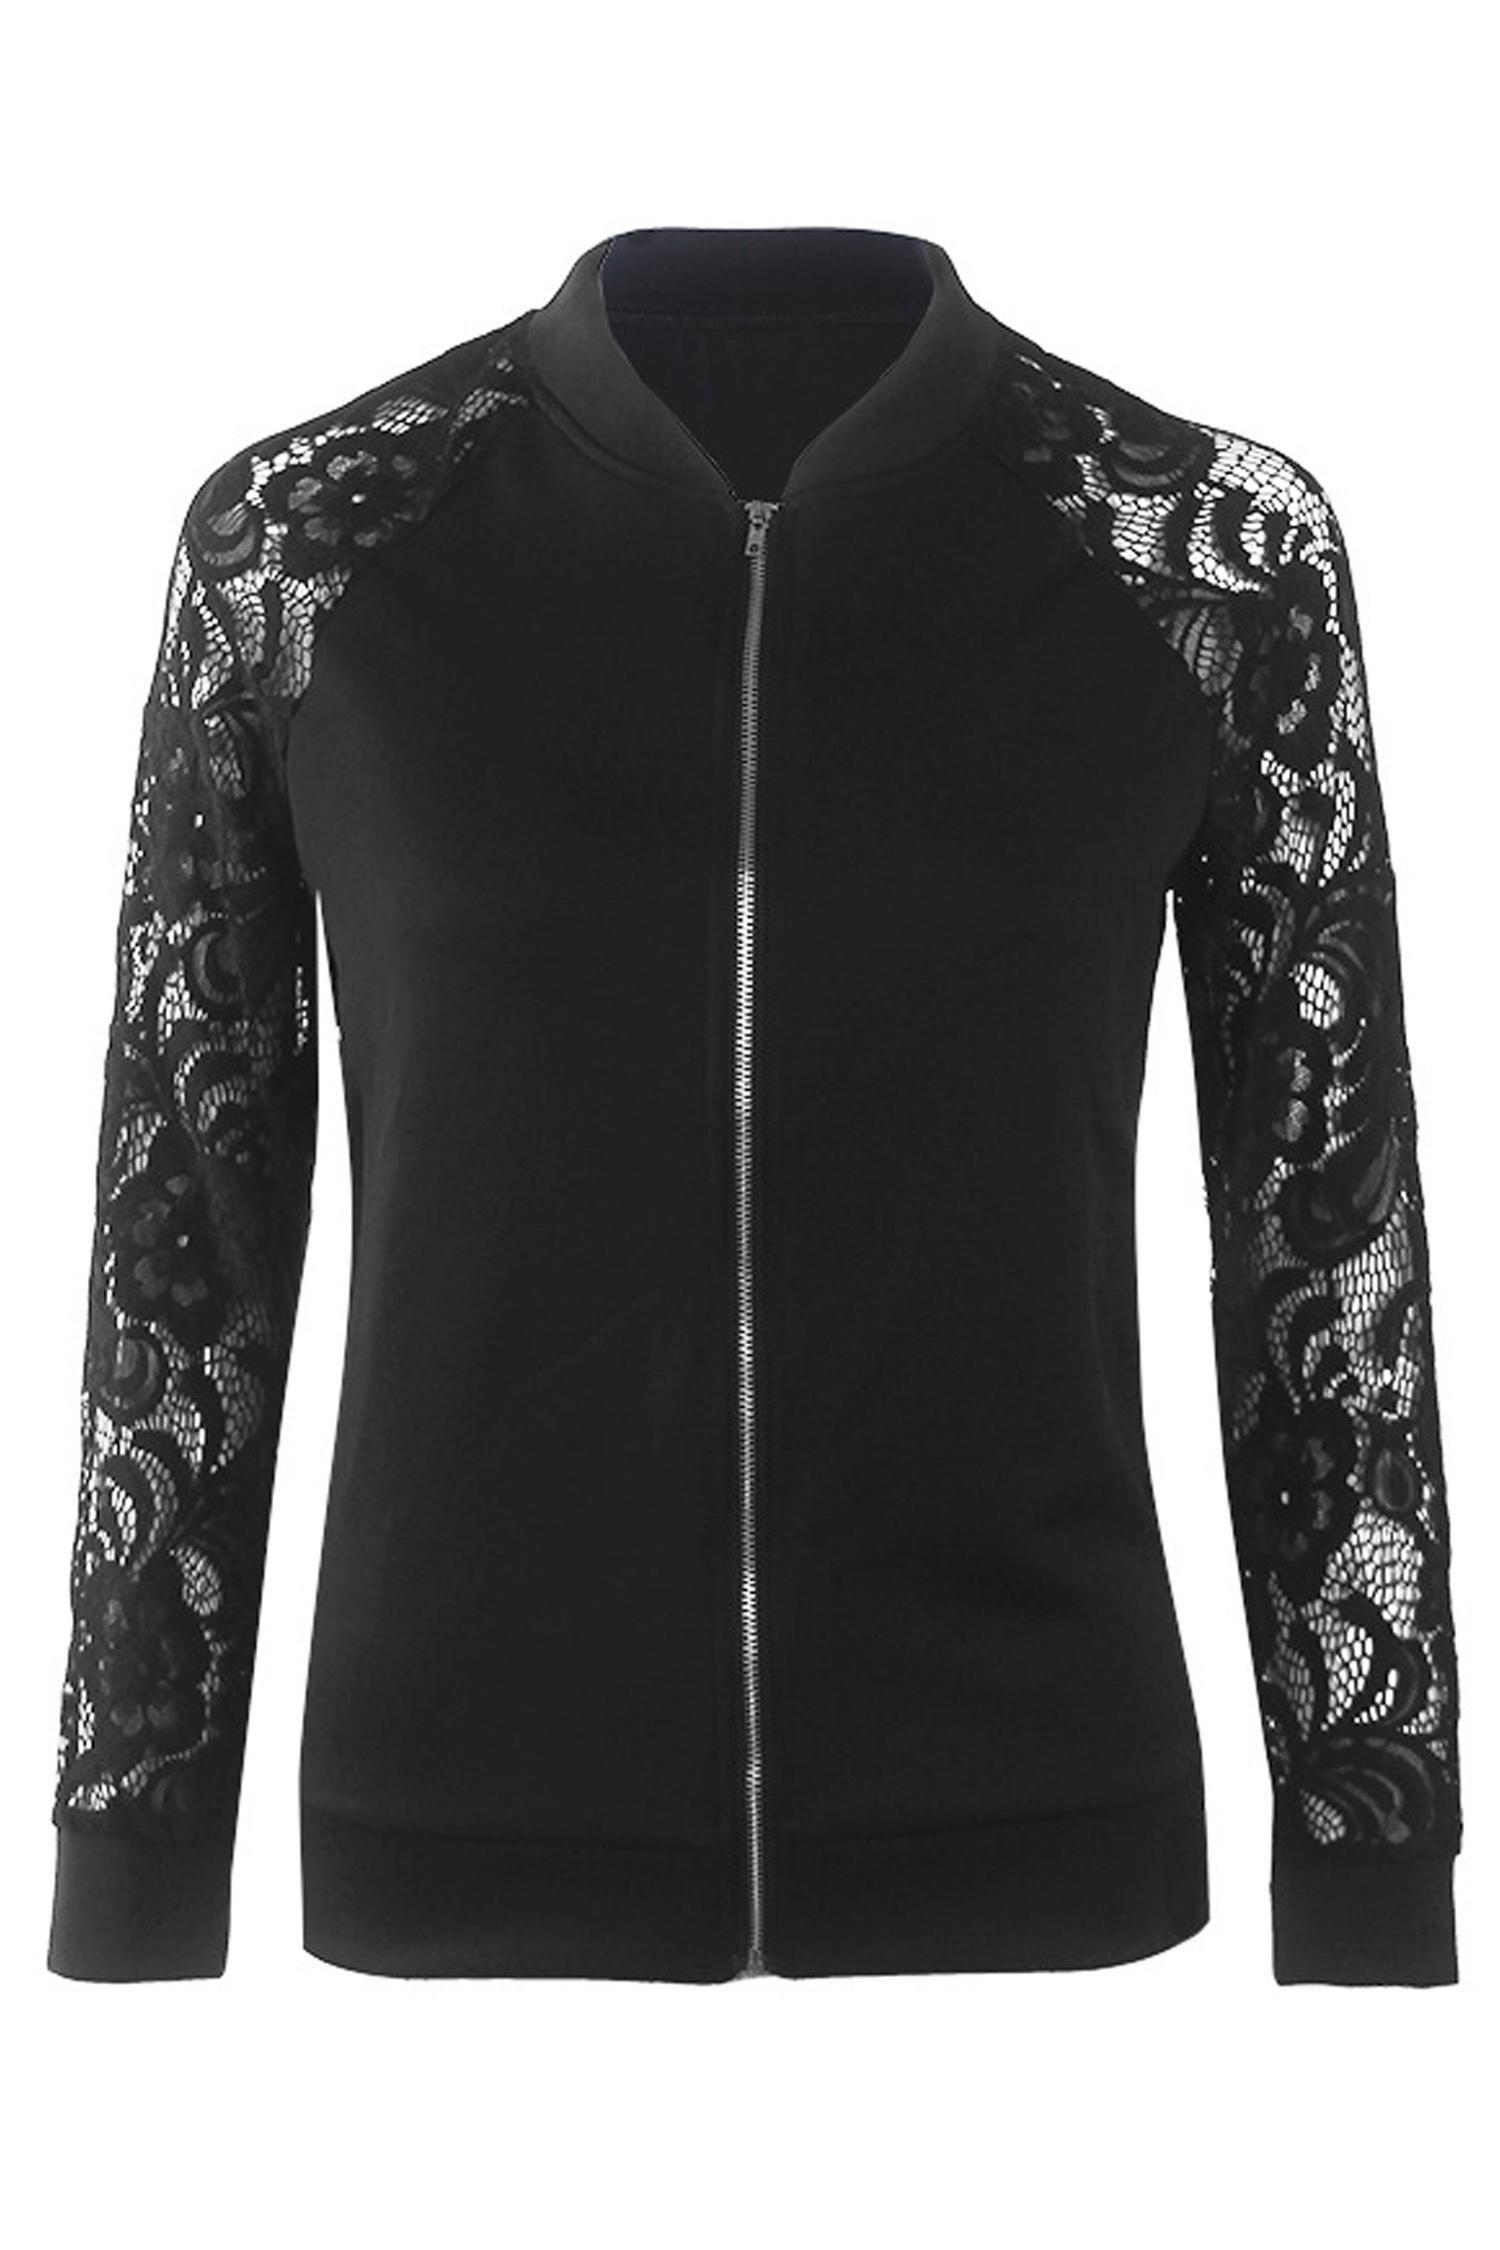 Zeagoo Women's Casual Long Sleeve Lace Patchwork Zipper Up Bomber Jacket Top